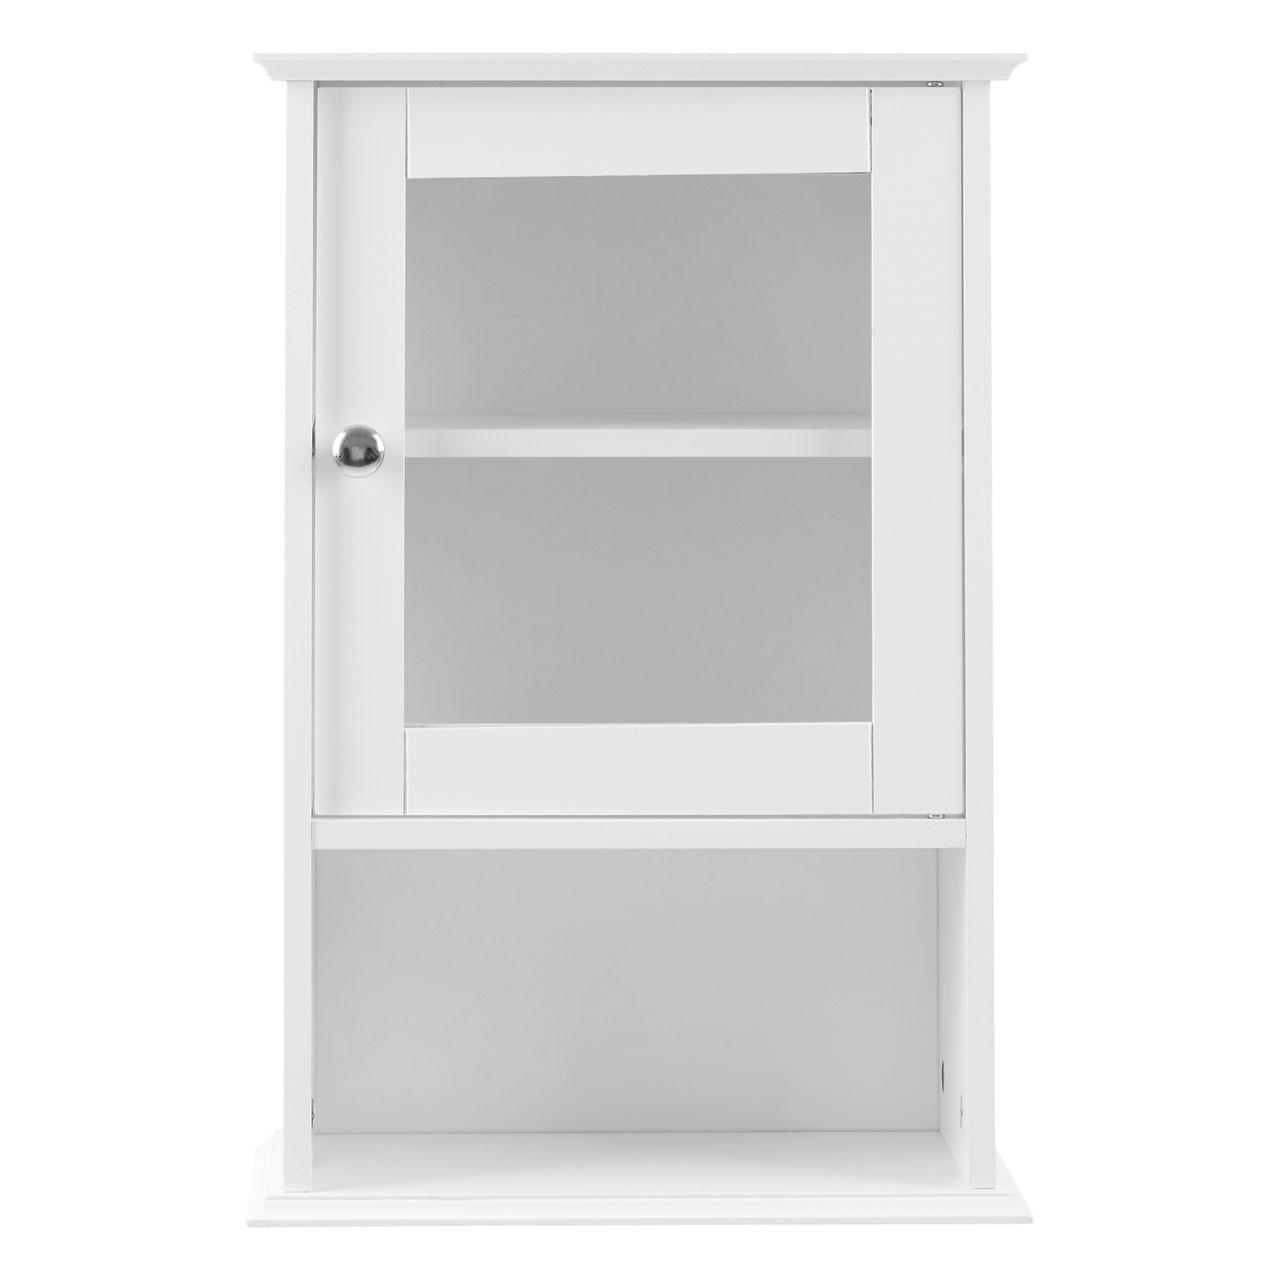 Bendheim Cabinet Glass - Cabinet Door Glass, Glass Inserts